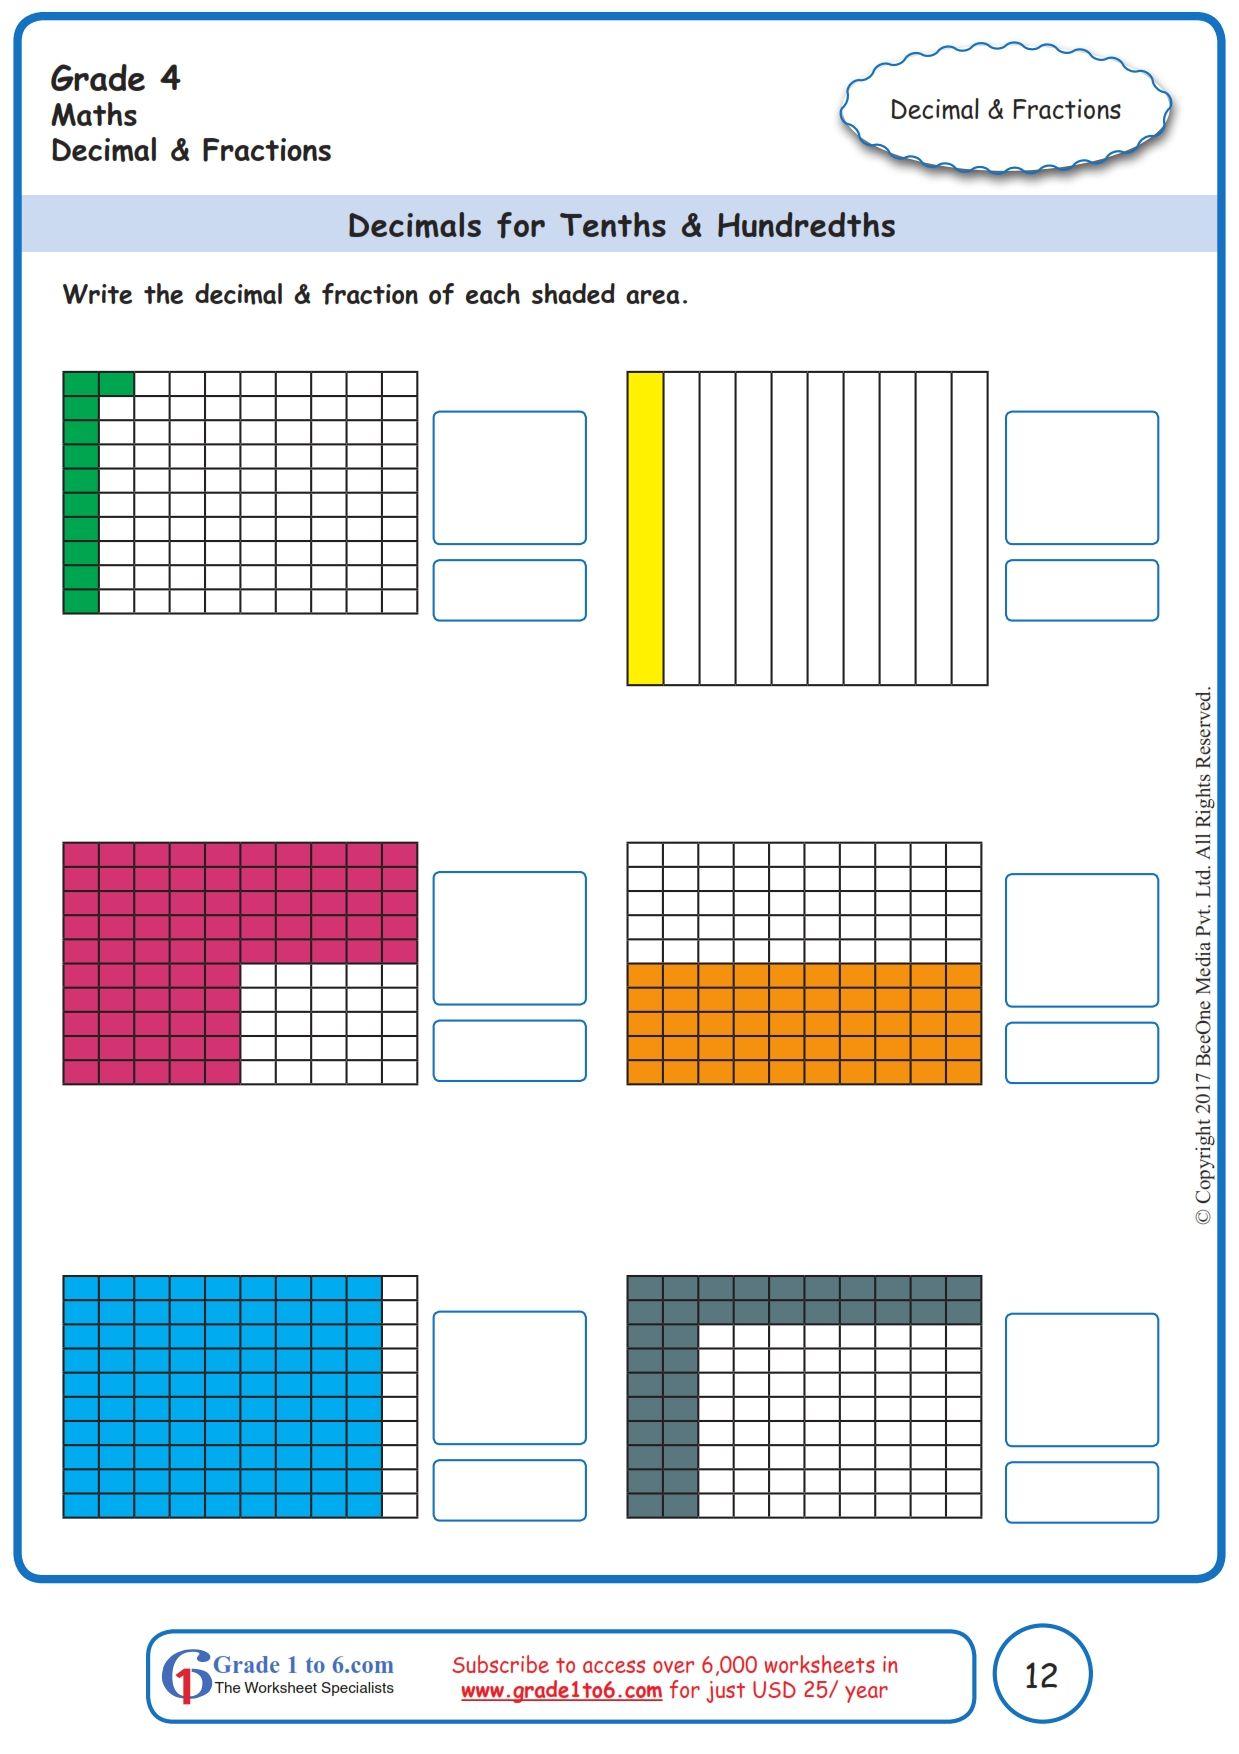 Fresh Ideas - FREE Math worksheets for Grade 1 through Grade 6